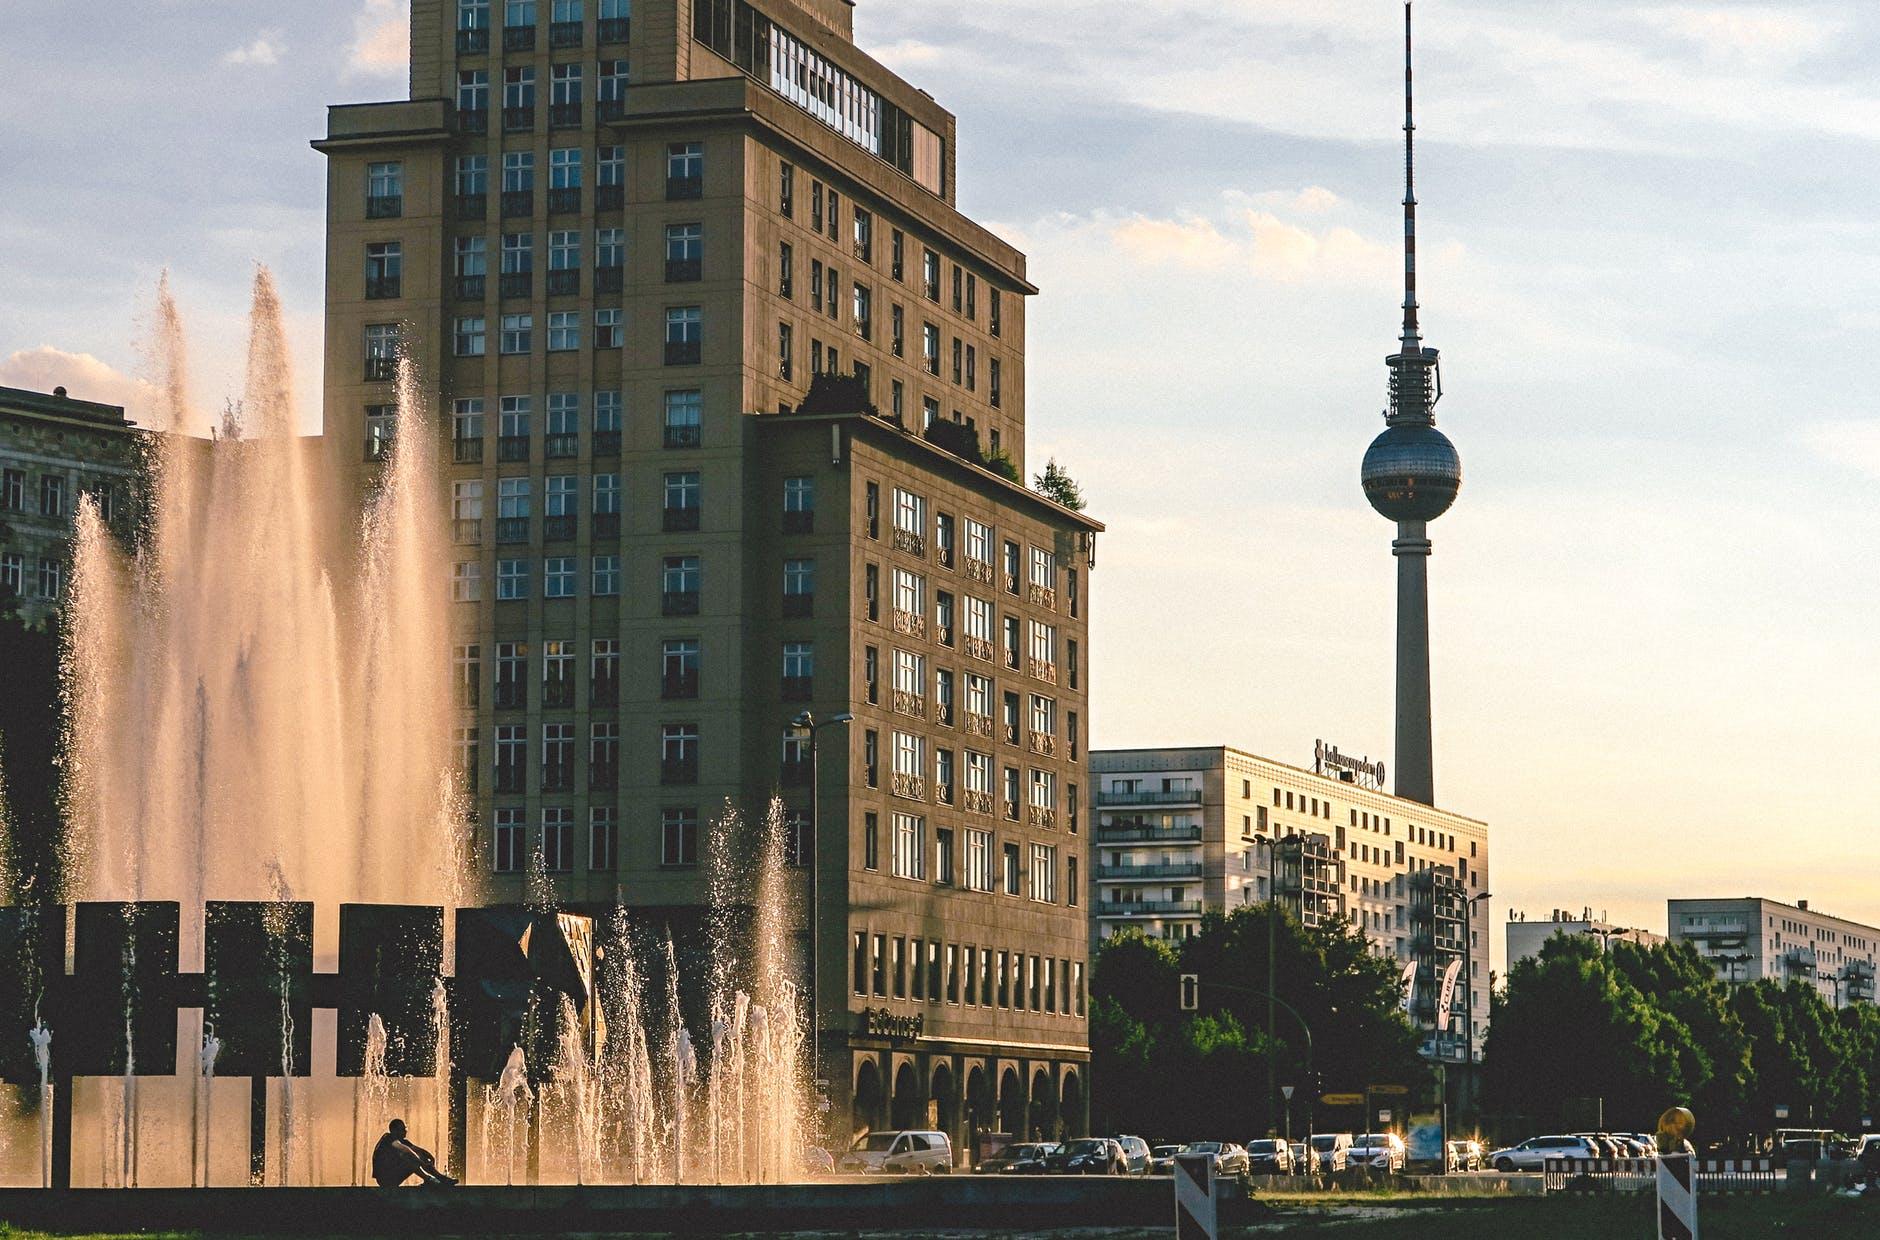 English book group in Berlin